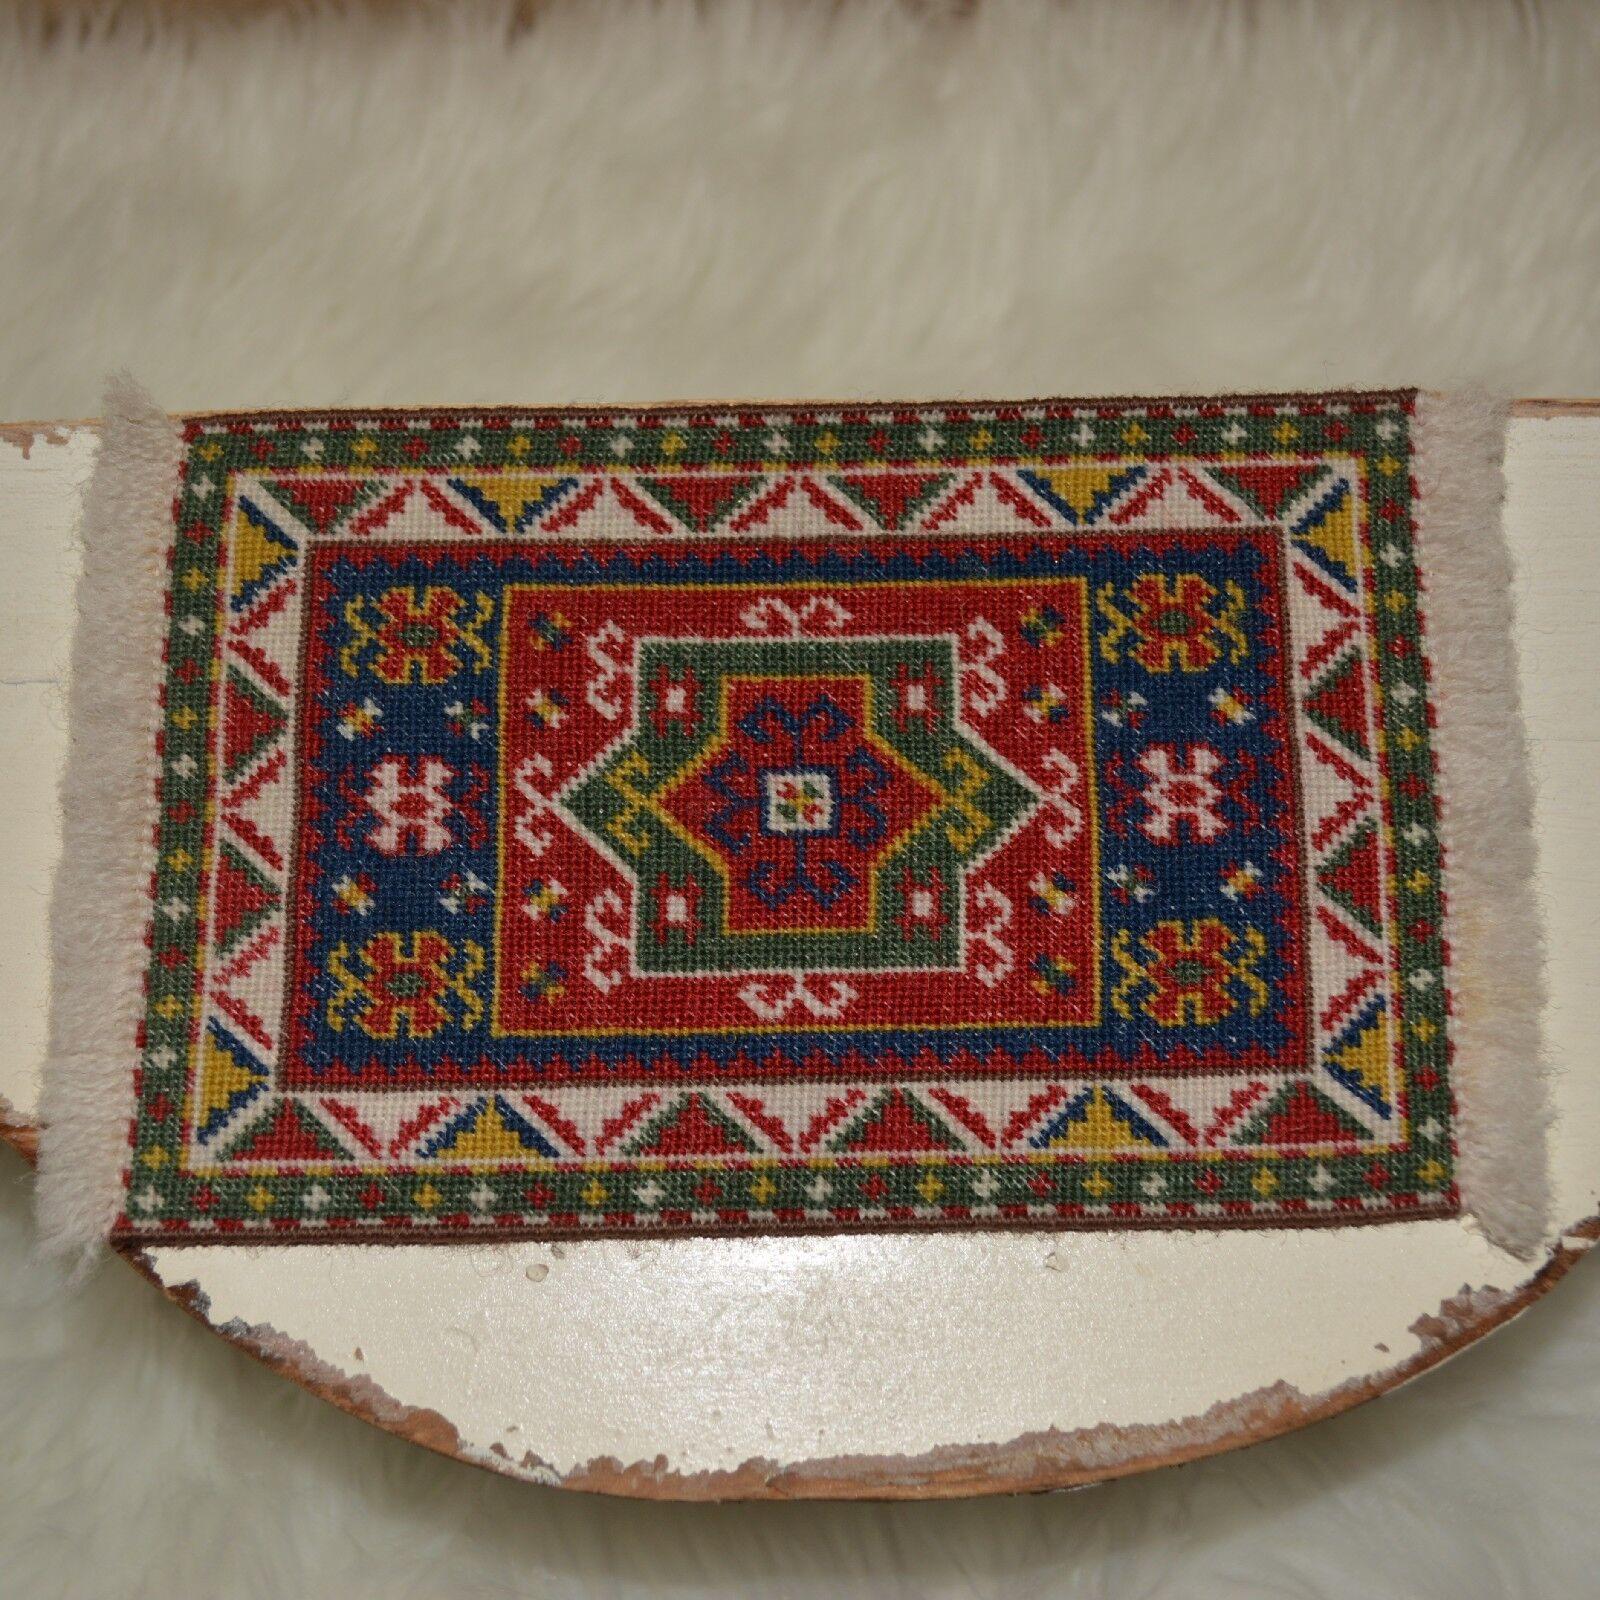 Dollhouse miniature petit point carpet 1 12 rug approx. 14,000 stitches